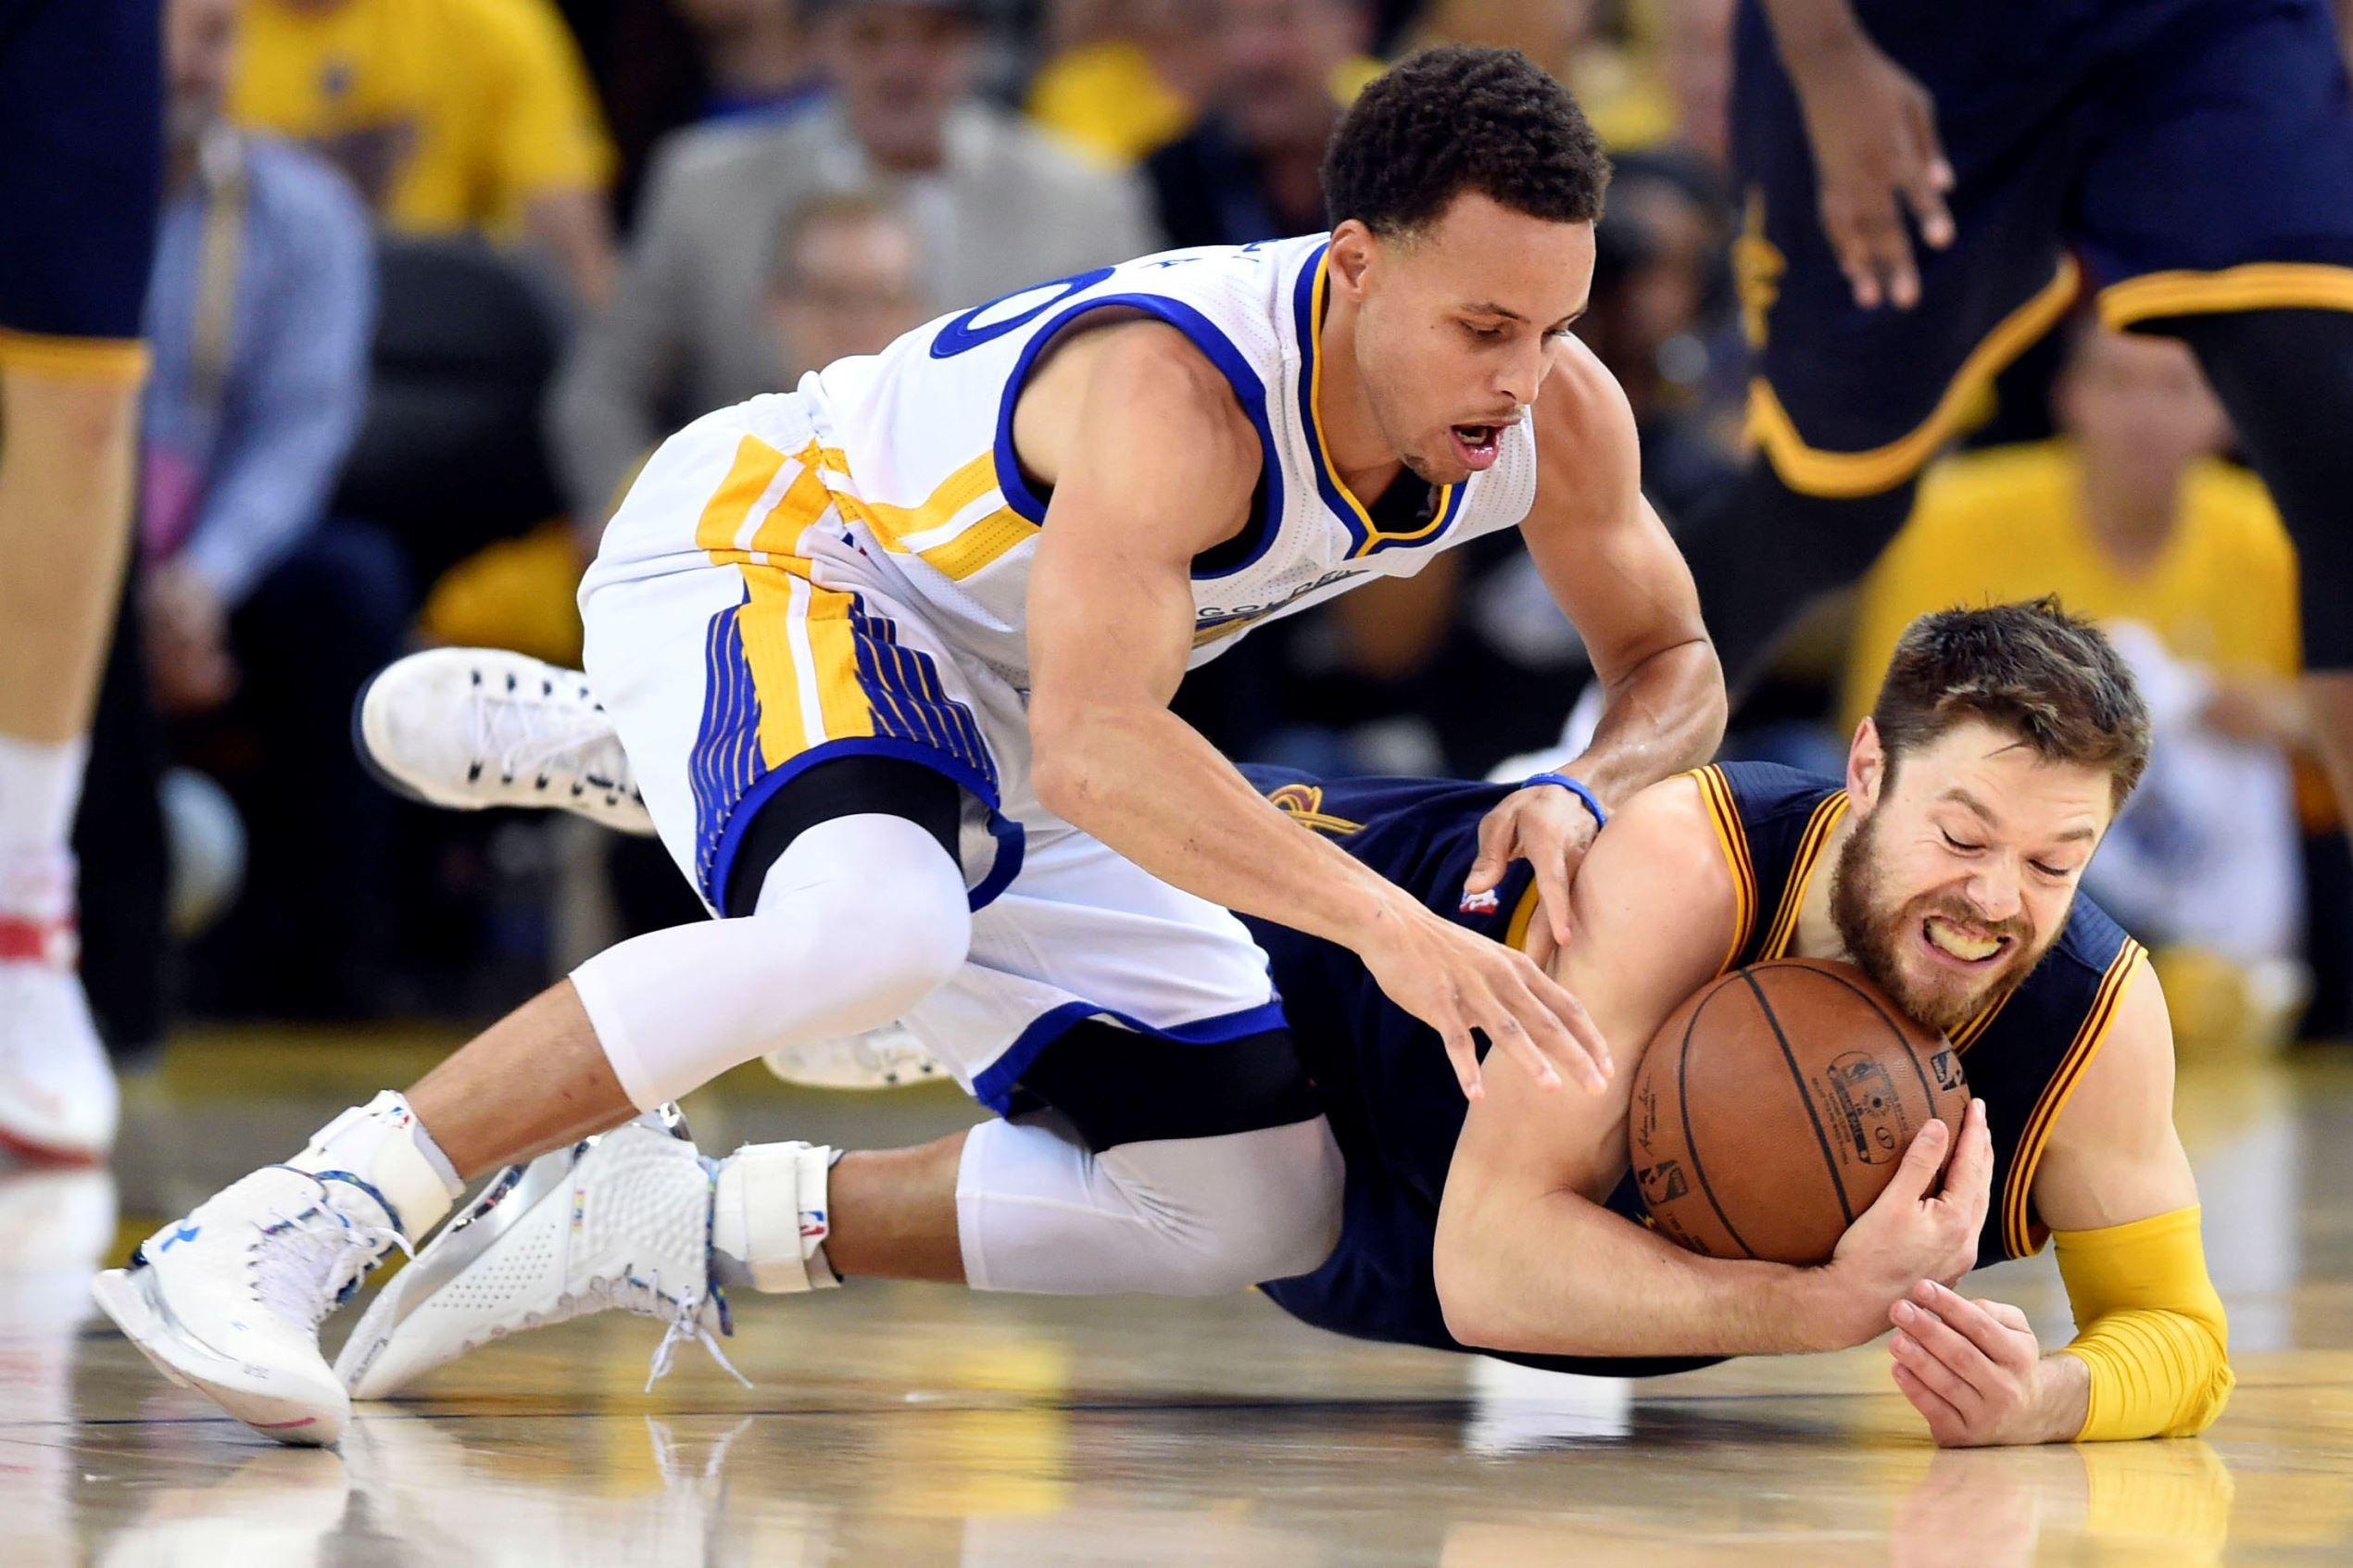 Warriors were best team all season, title is fitting